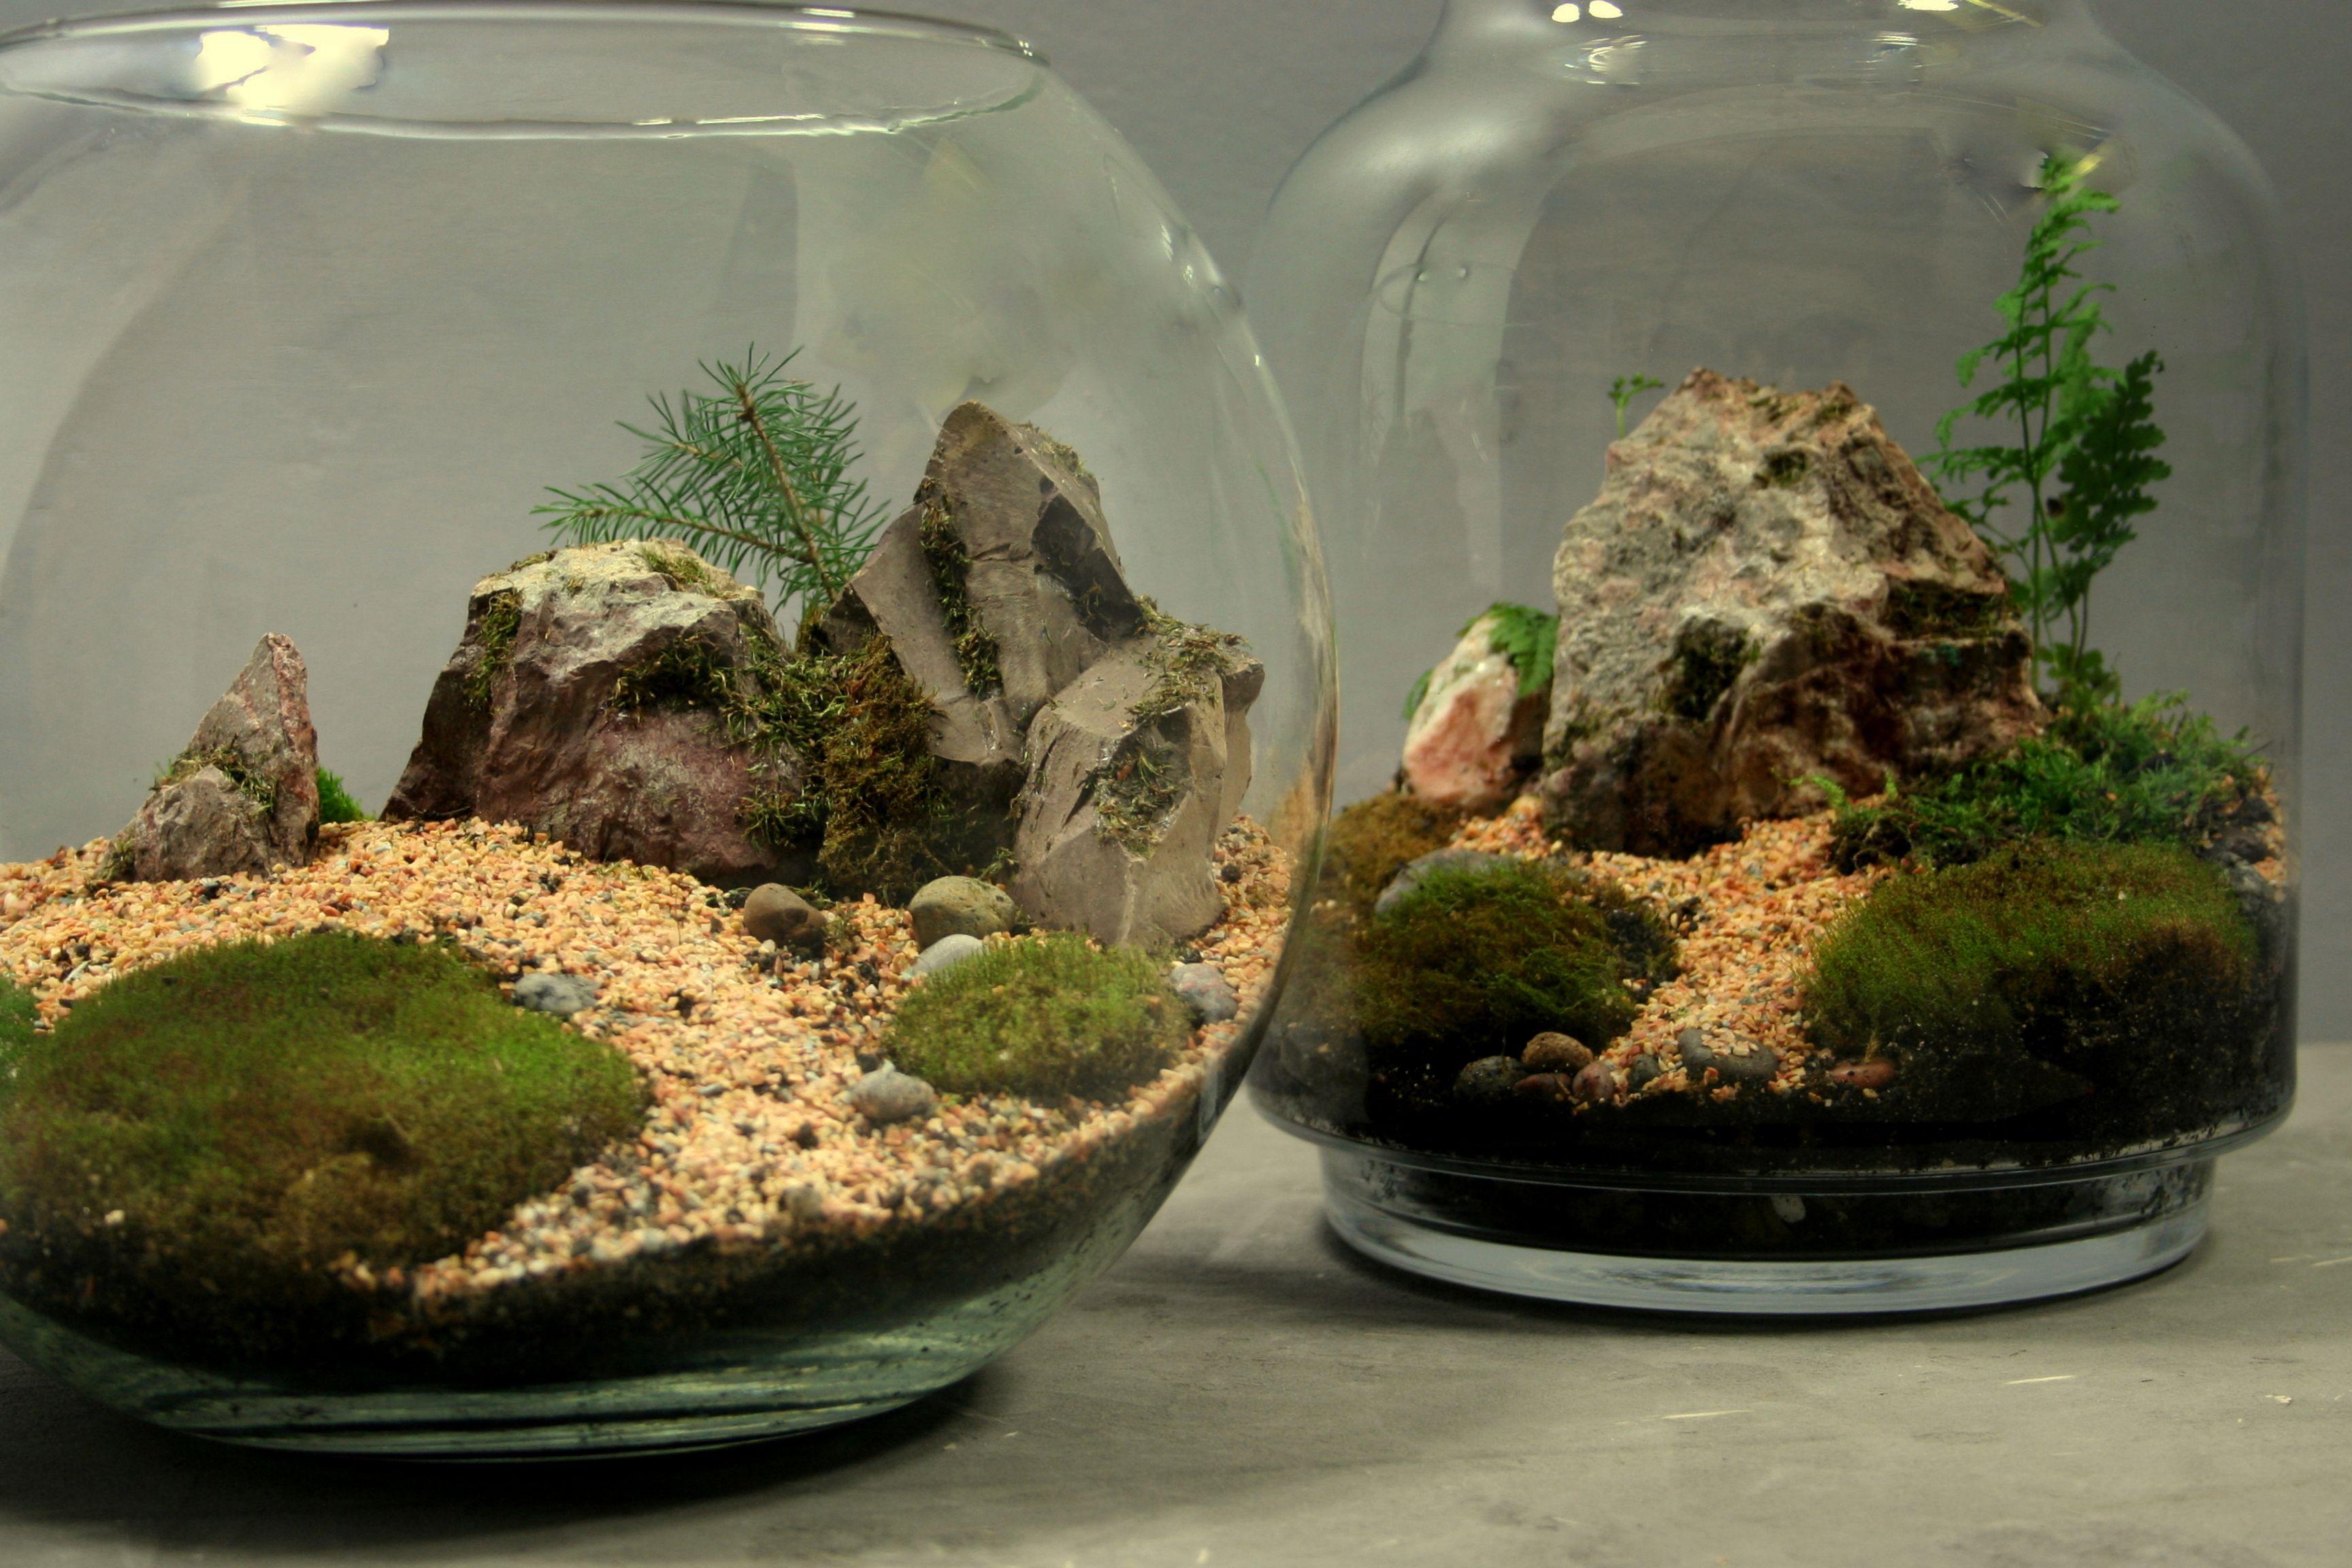 Terraria, Cactus, Stones, Garden Layouts, Succulents, Scenery, Prickly Pear Cactus,